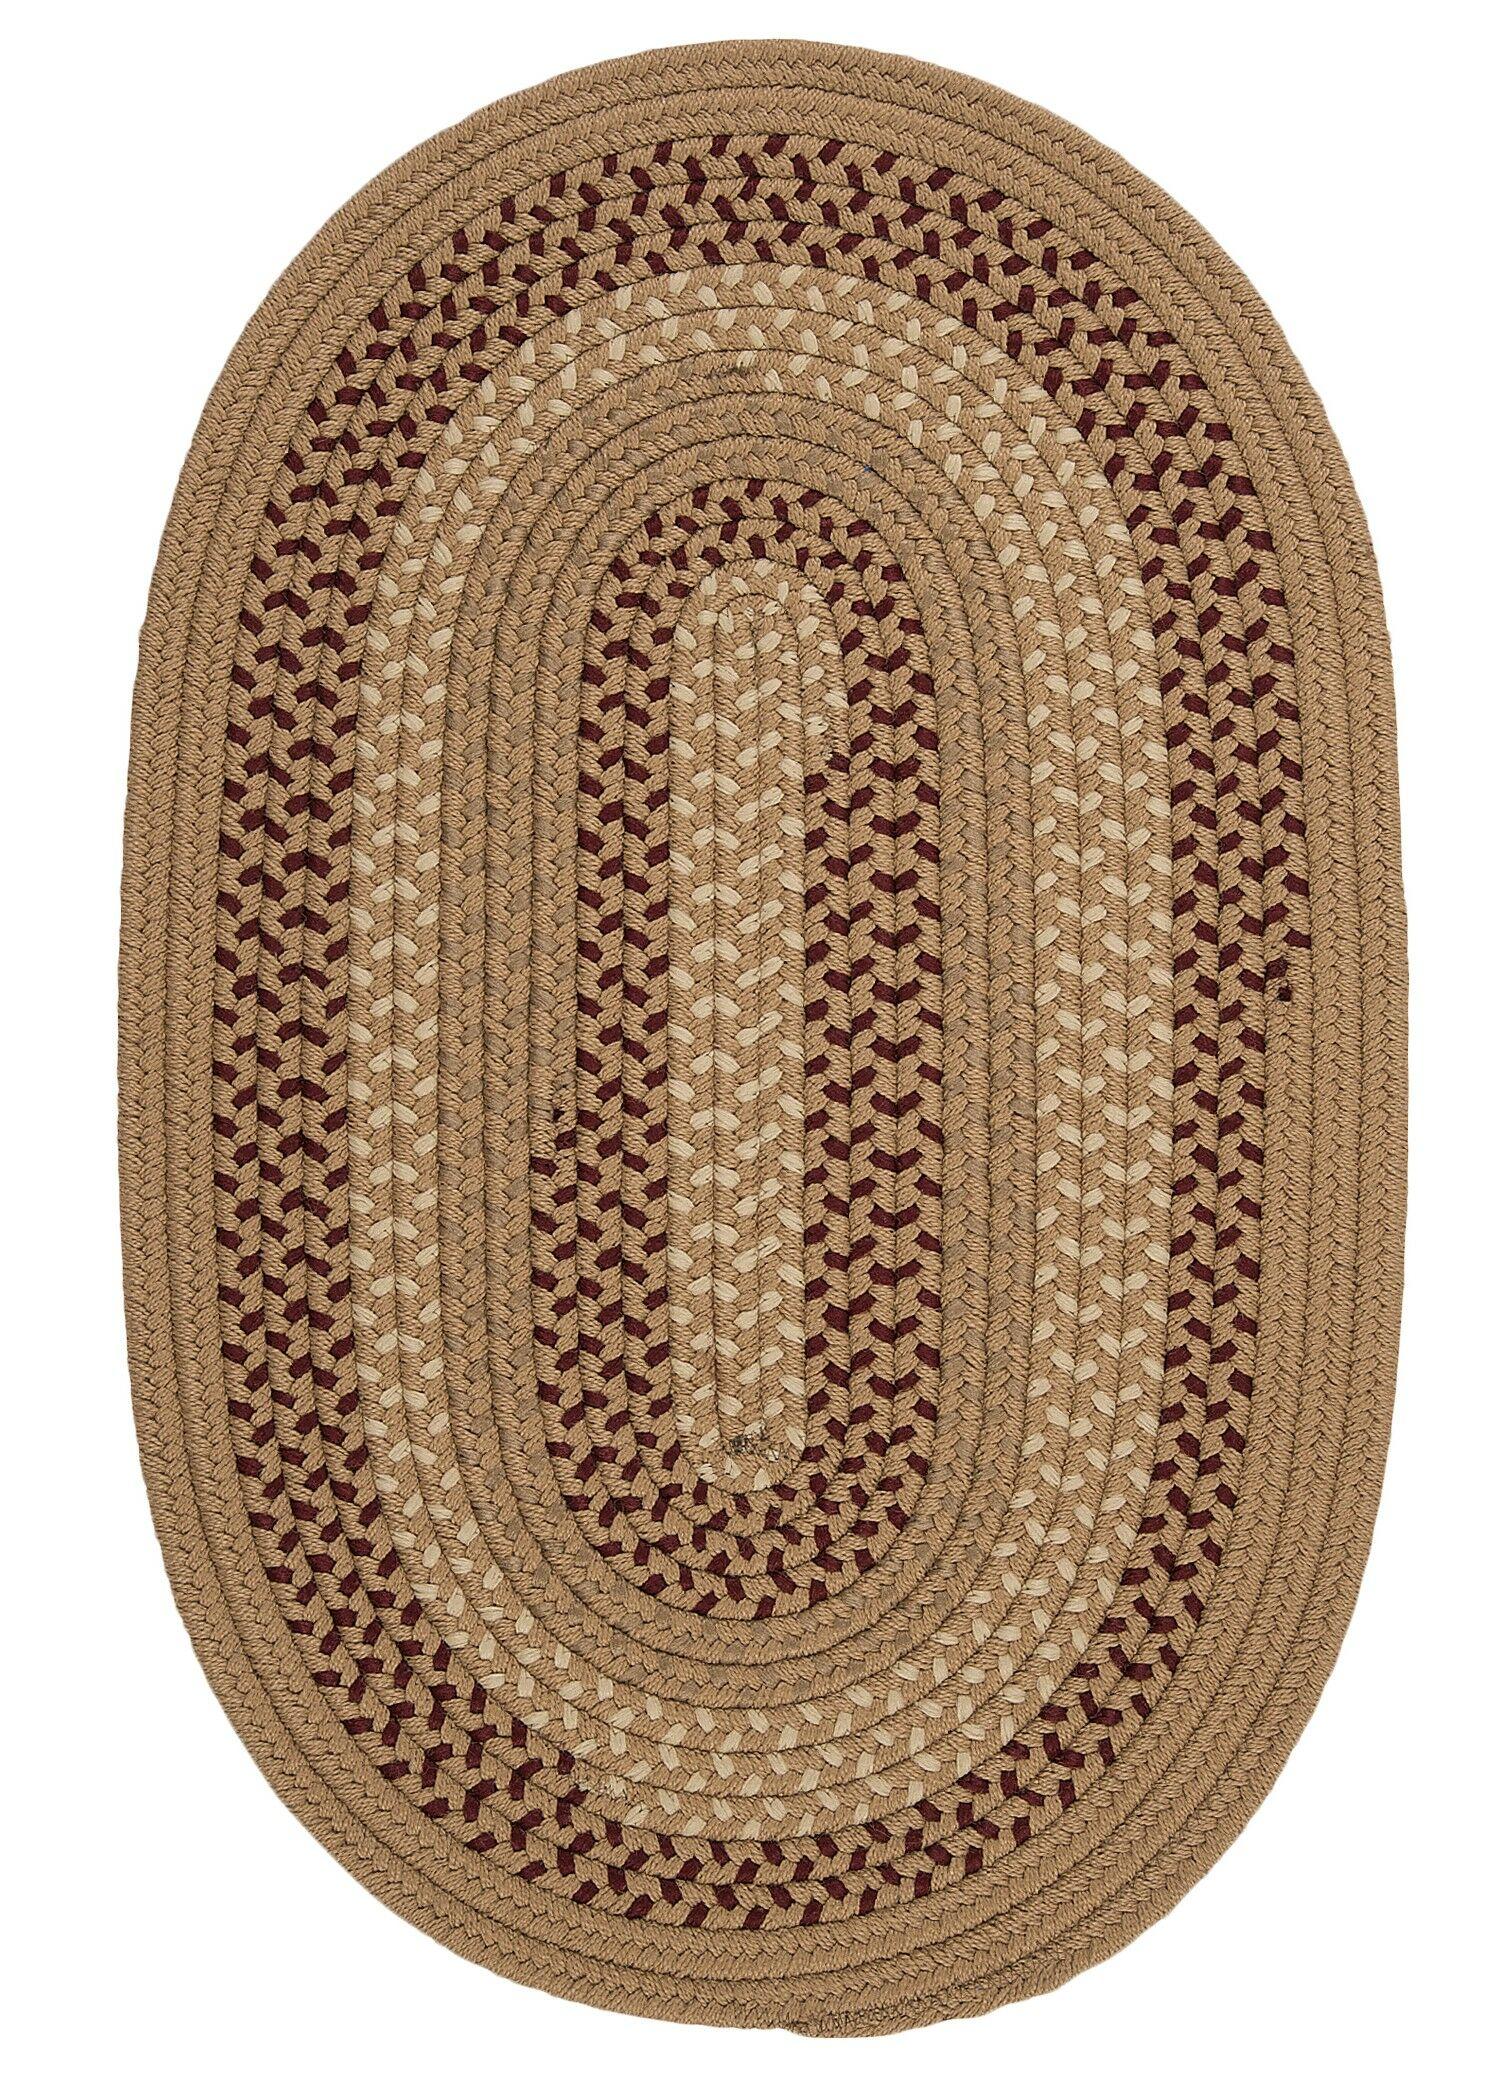 Omaha Taupe Indoor/Outdoor Area Rug Rug Size: Oval 10' x 13'